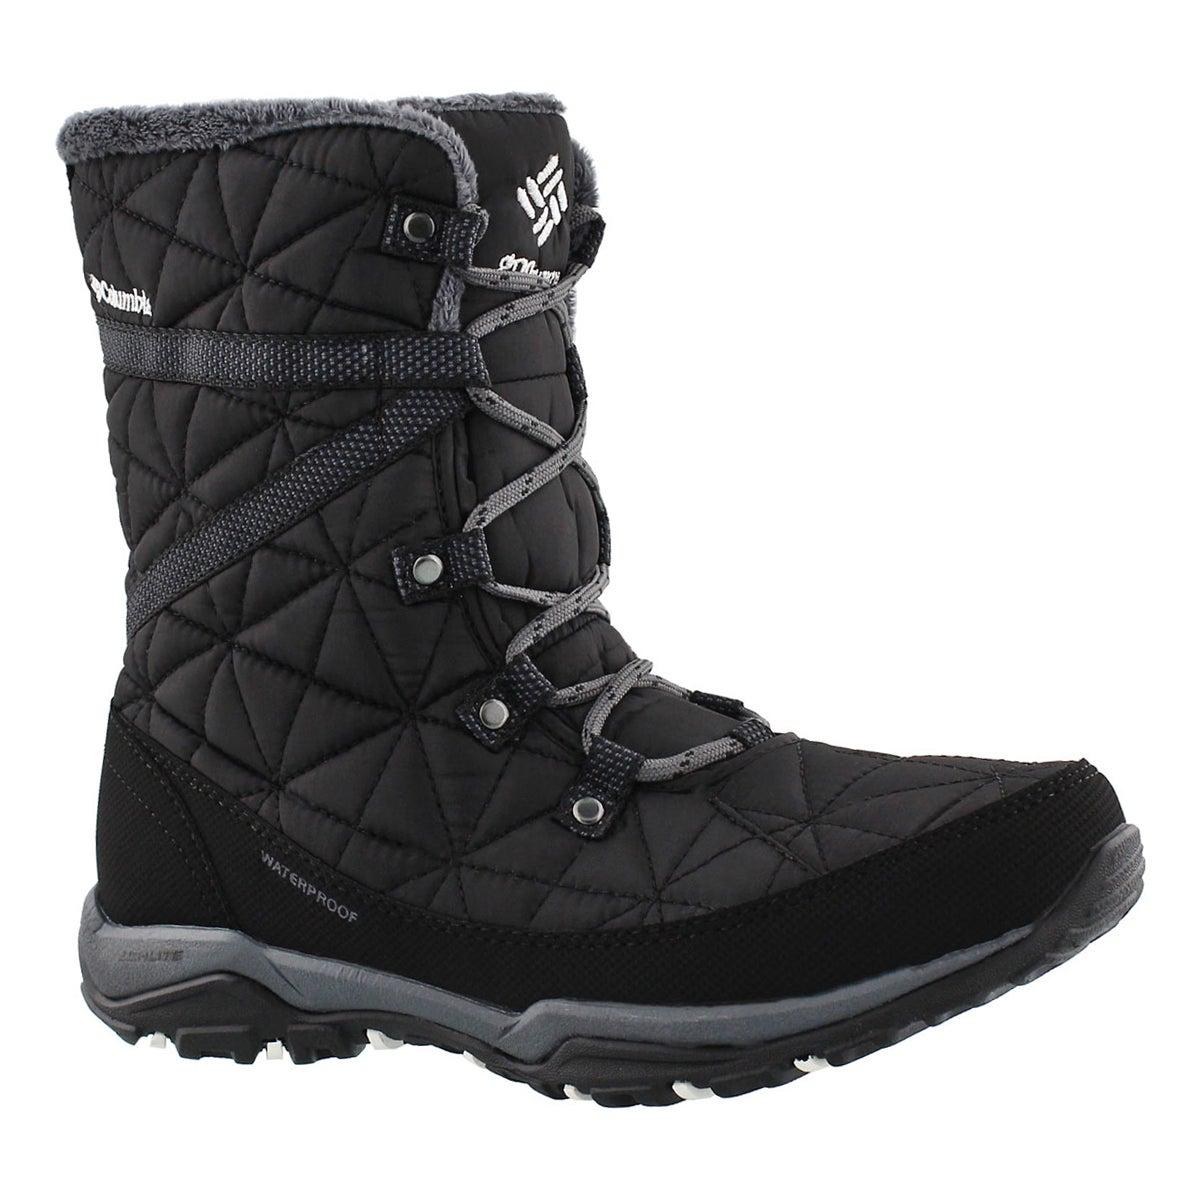 Women's LOVELAND MID OmniHeat black boots